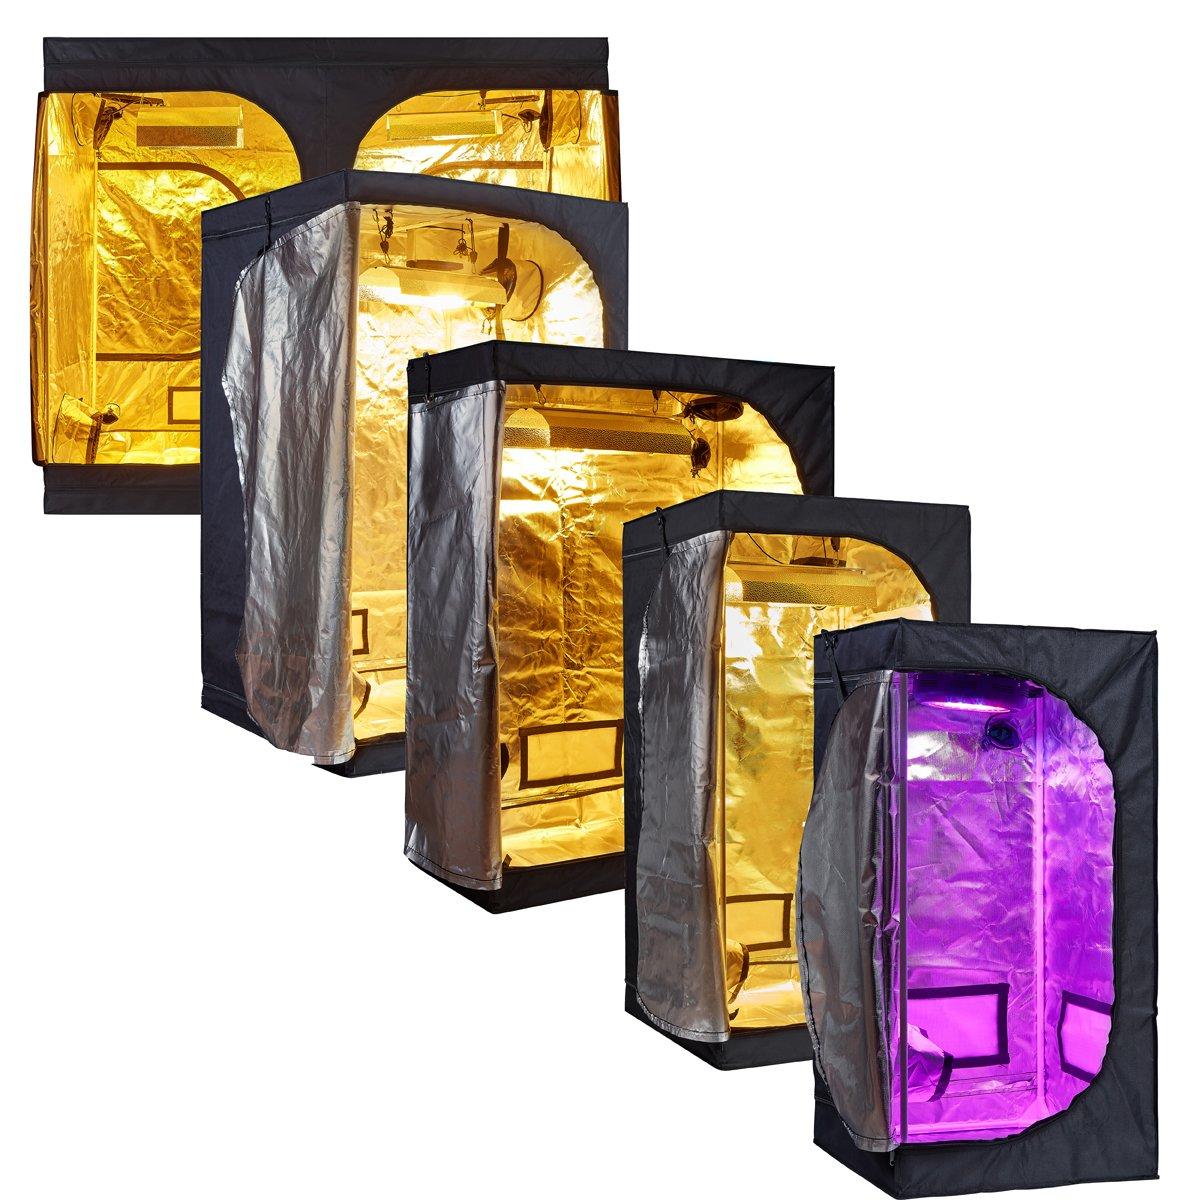 TopoLite Full Range Multiple Sized 24″x24″x48″ 32″x32″x63″ 48″x24″x60″ 48″×48″×80″ 96″x48″x80″ 120″X120″X80″ Indoor Grow Tent Room 600D Mylar Hydroponic Growing Plant w/Plastic Corner